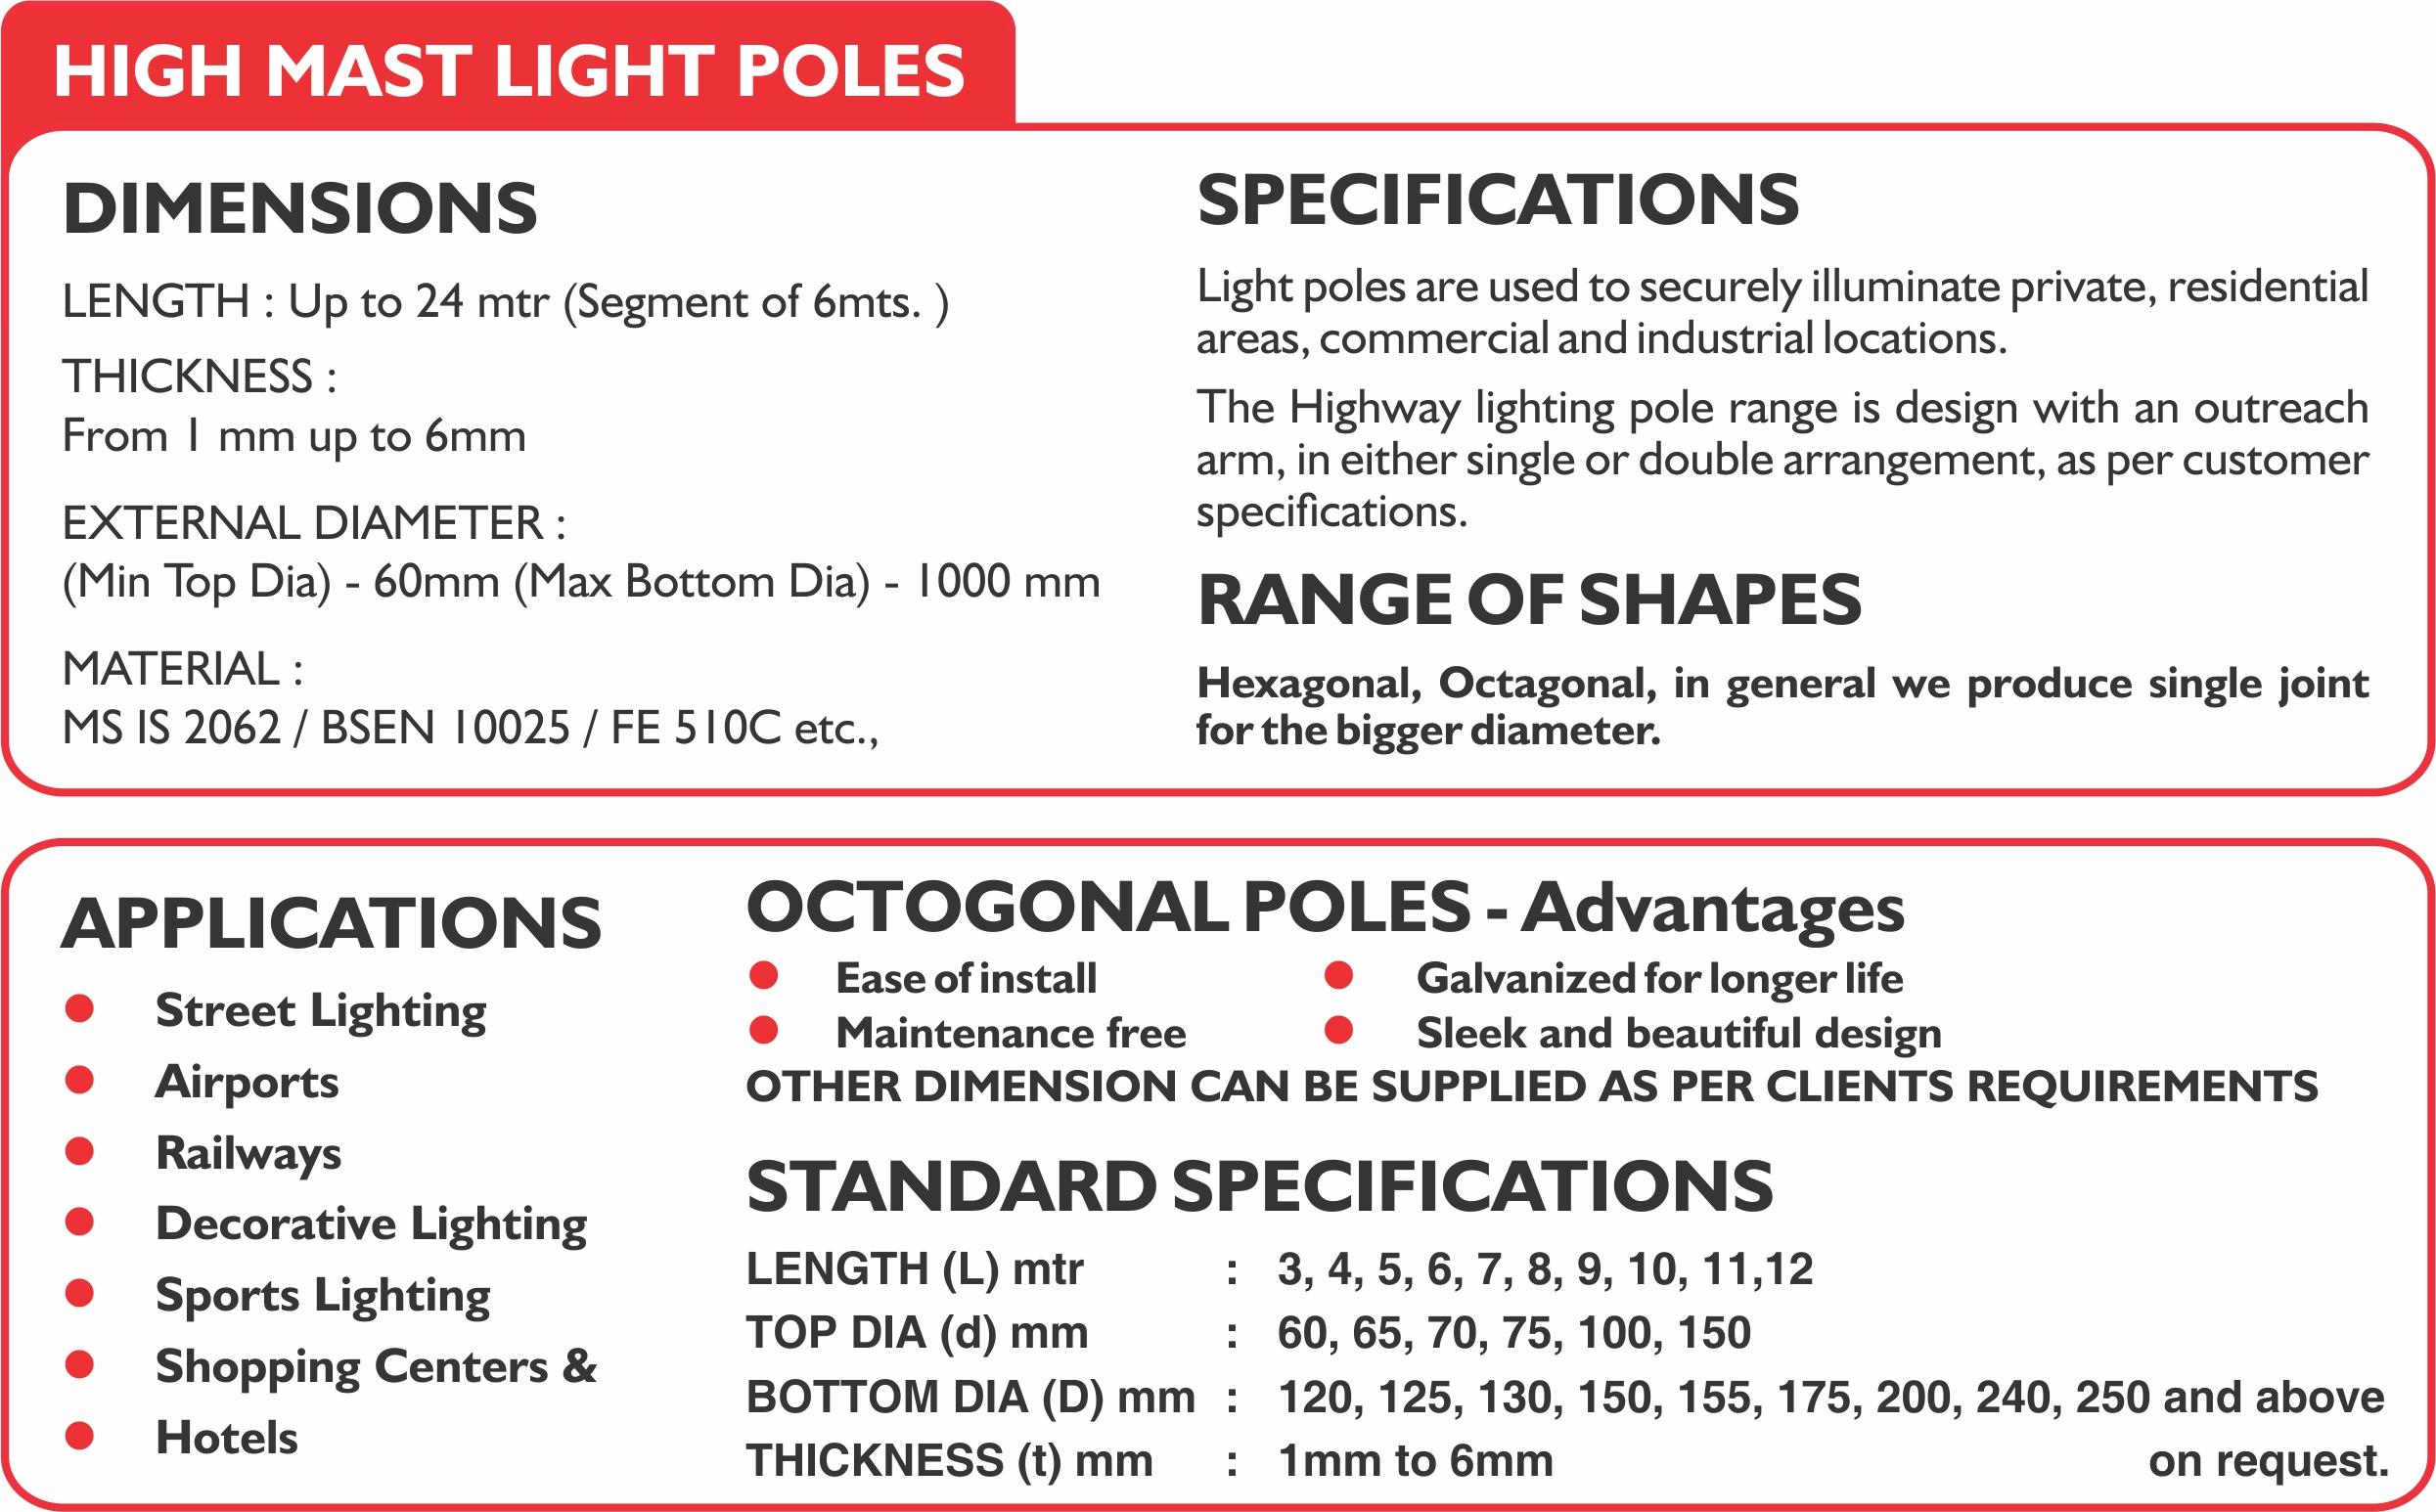 High Mast light poles